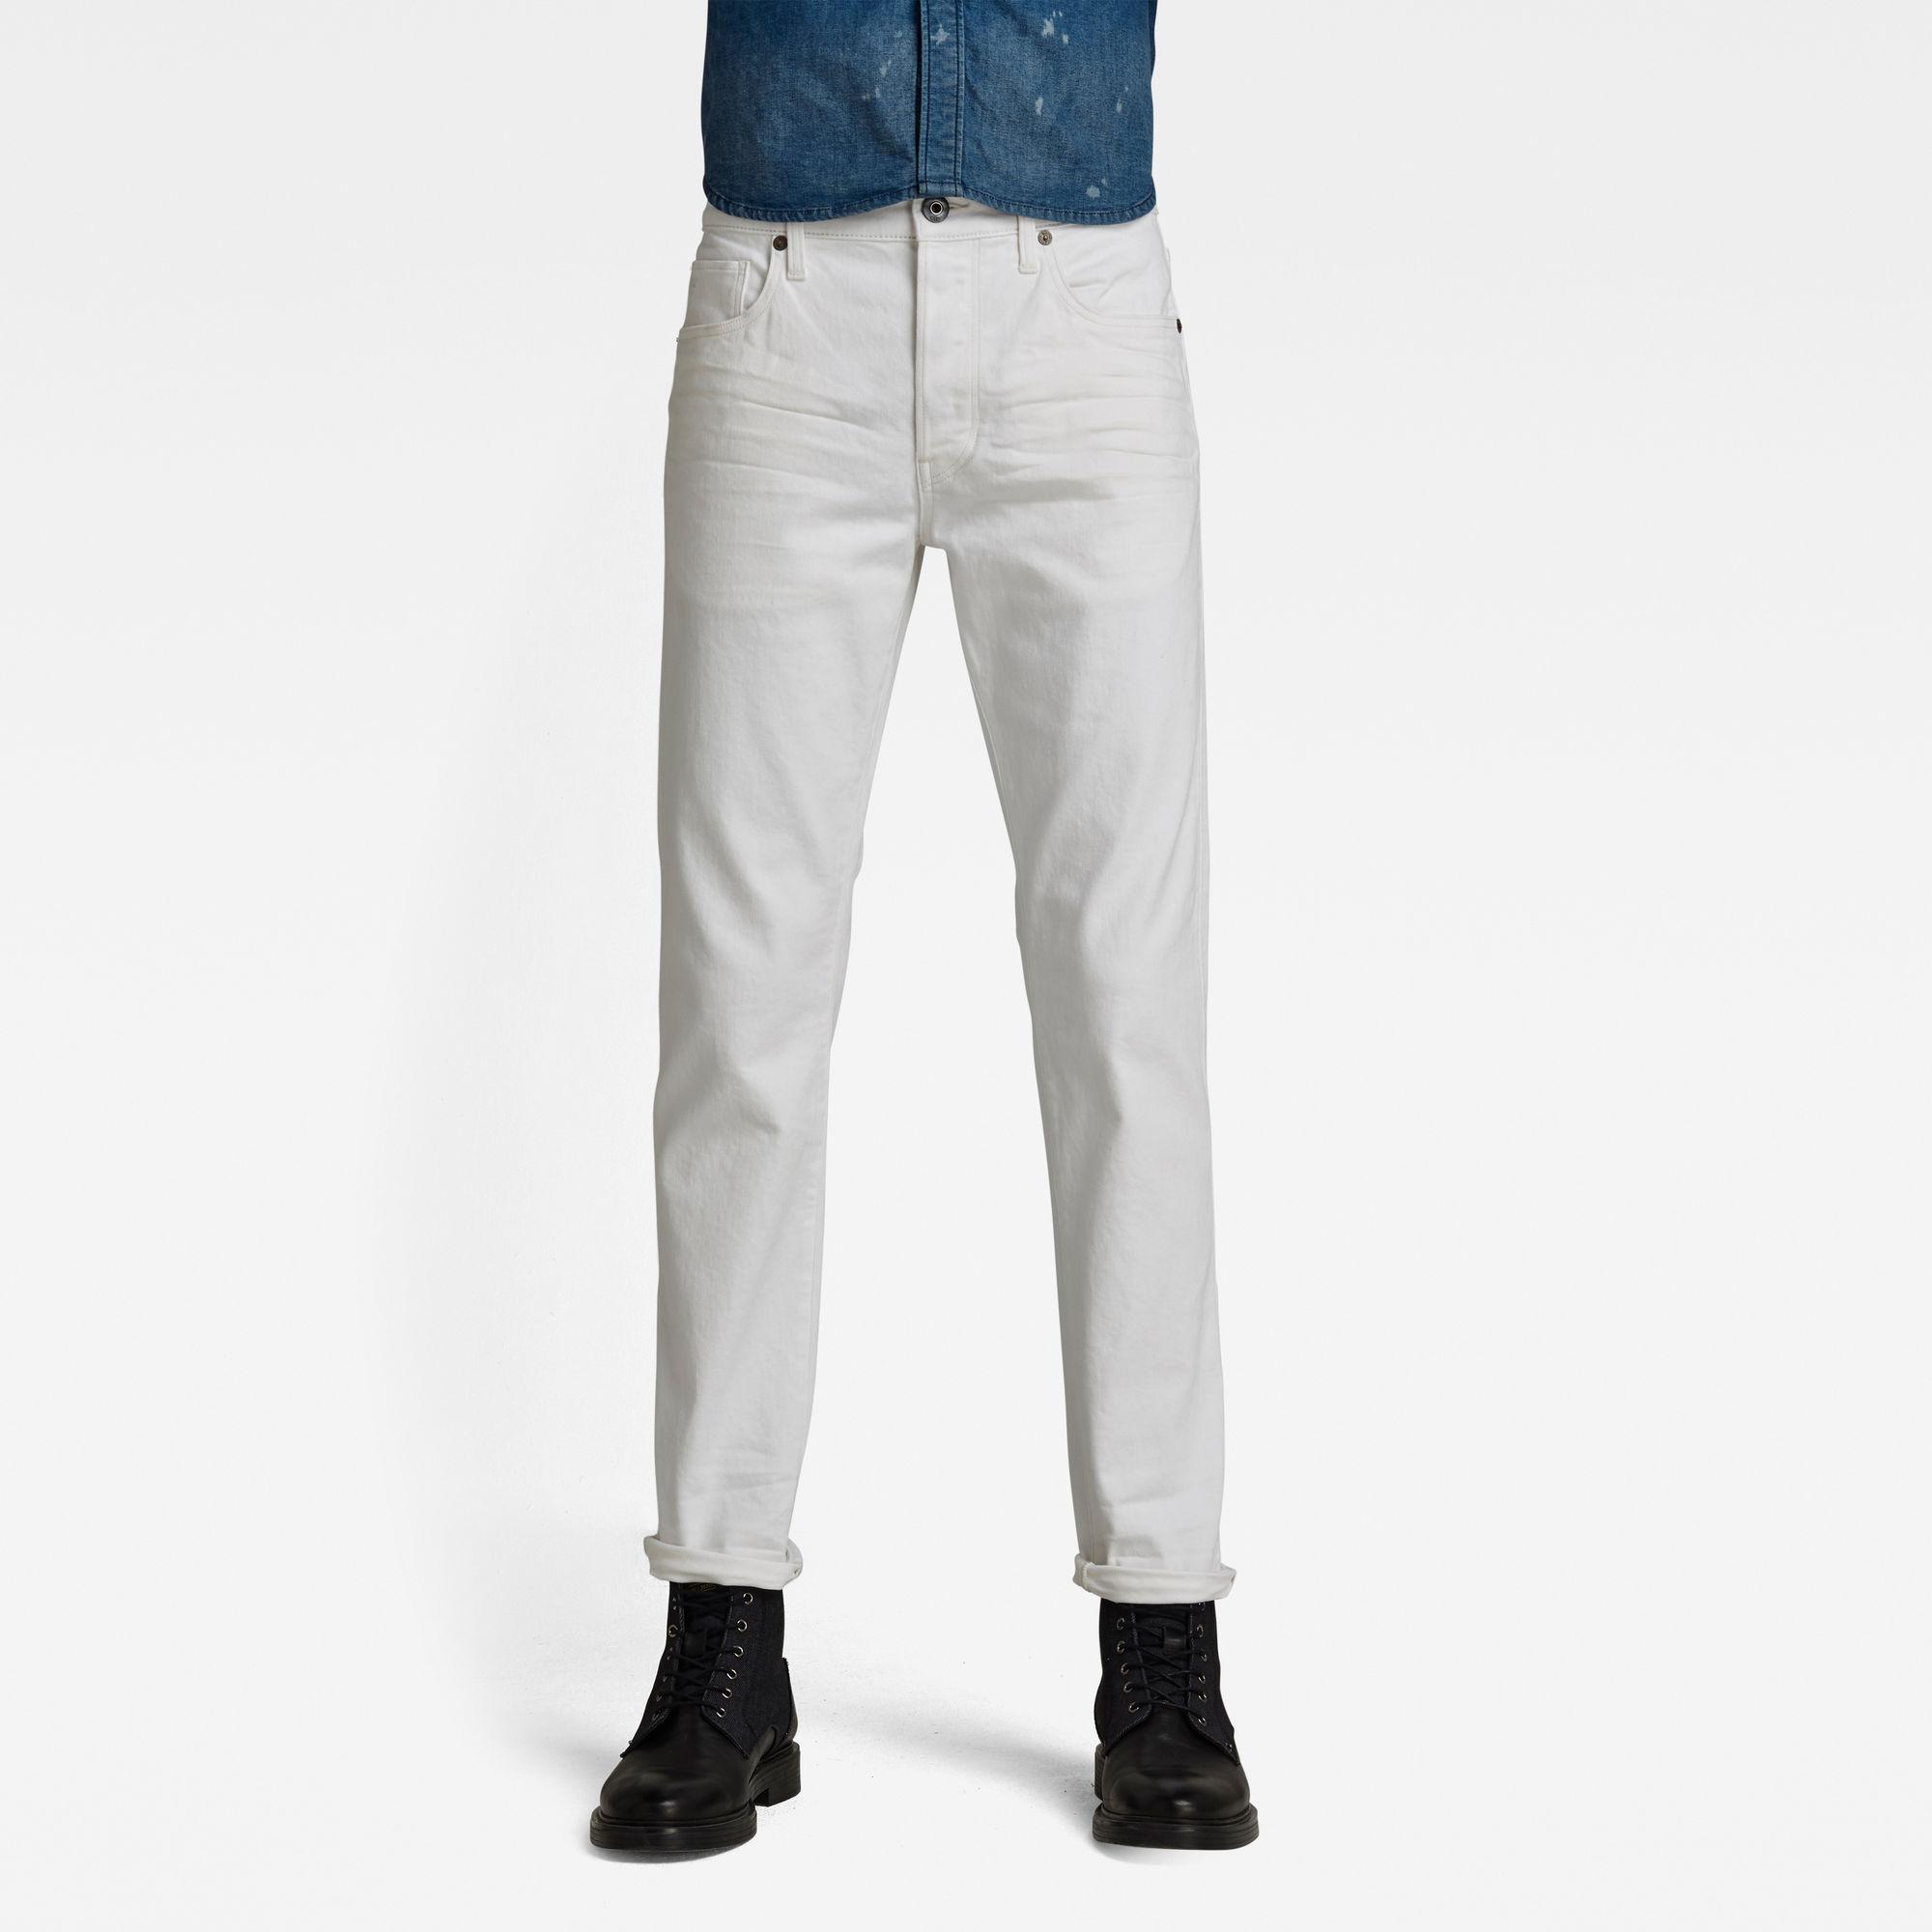 G-Star RAW Heren 3301 Slim Jeans Wit